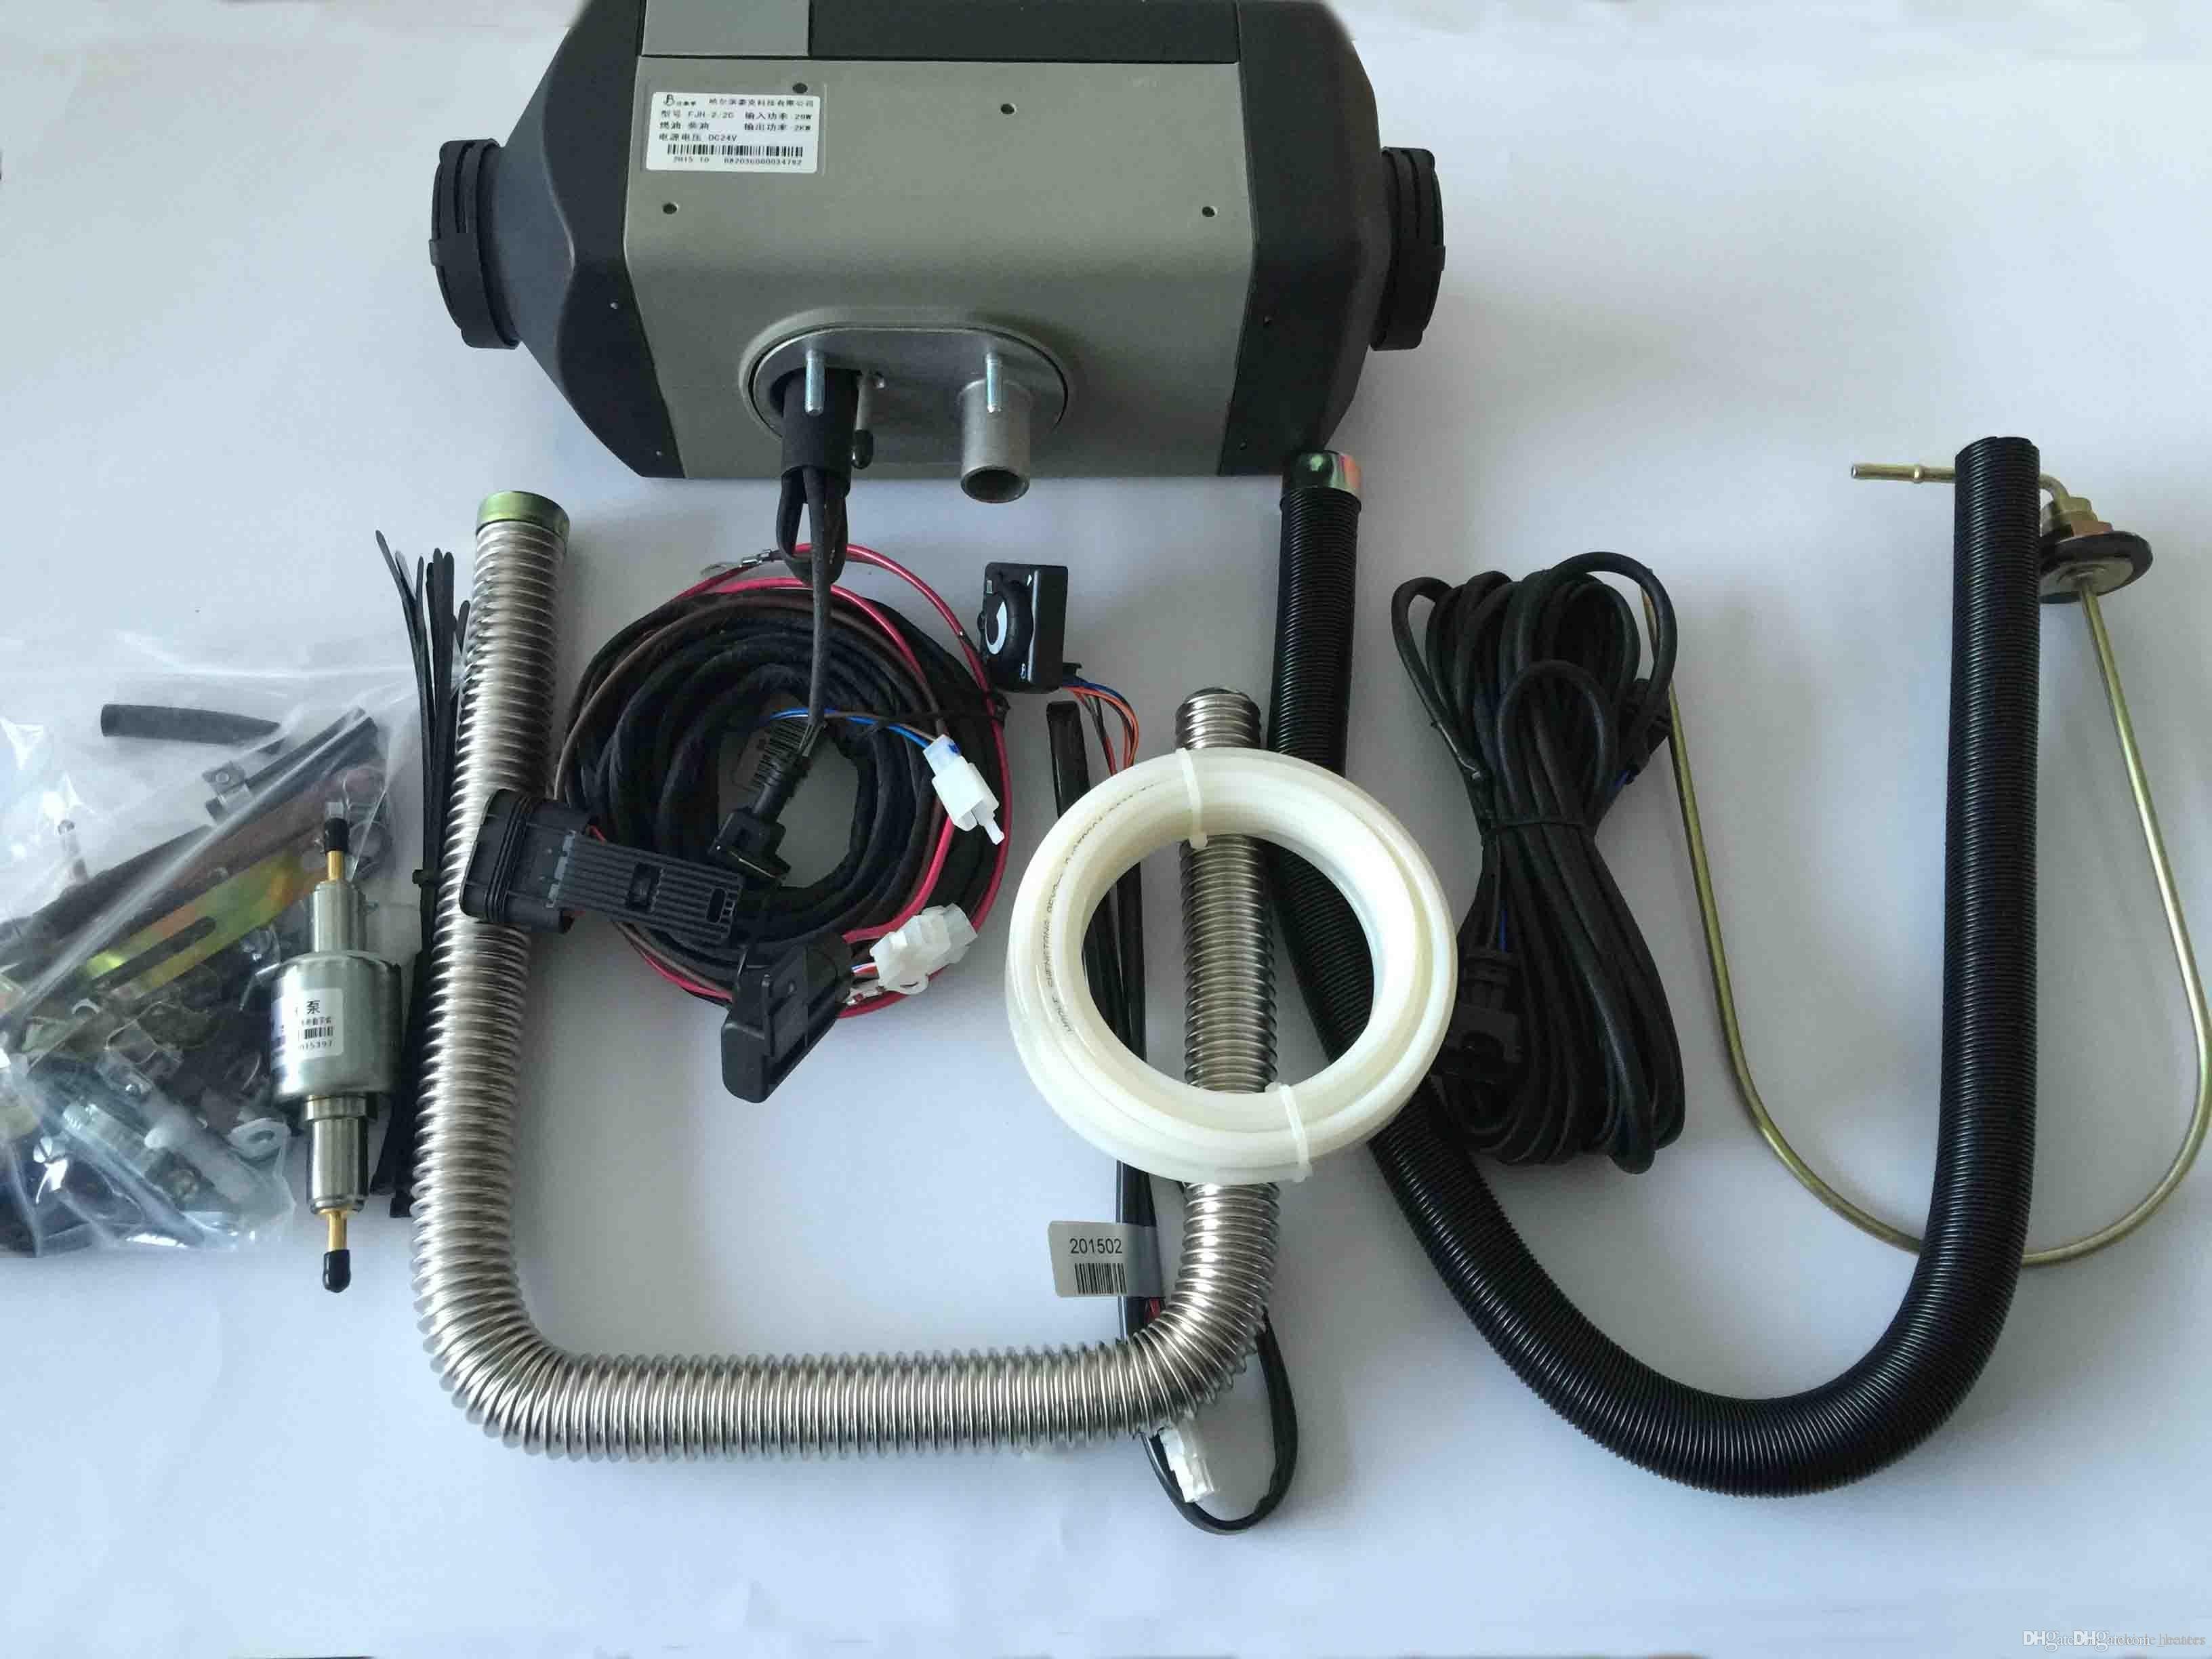 Car Heating System Diagram Drivworld Parking Heater 2kw 24v Diesel Air Car Boat Parking Heater